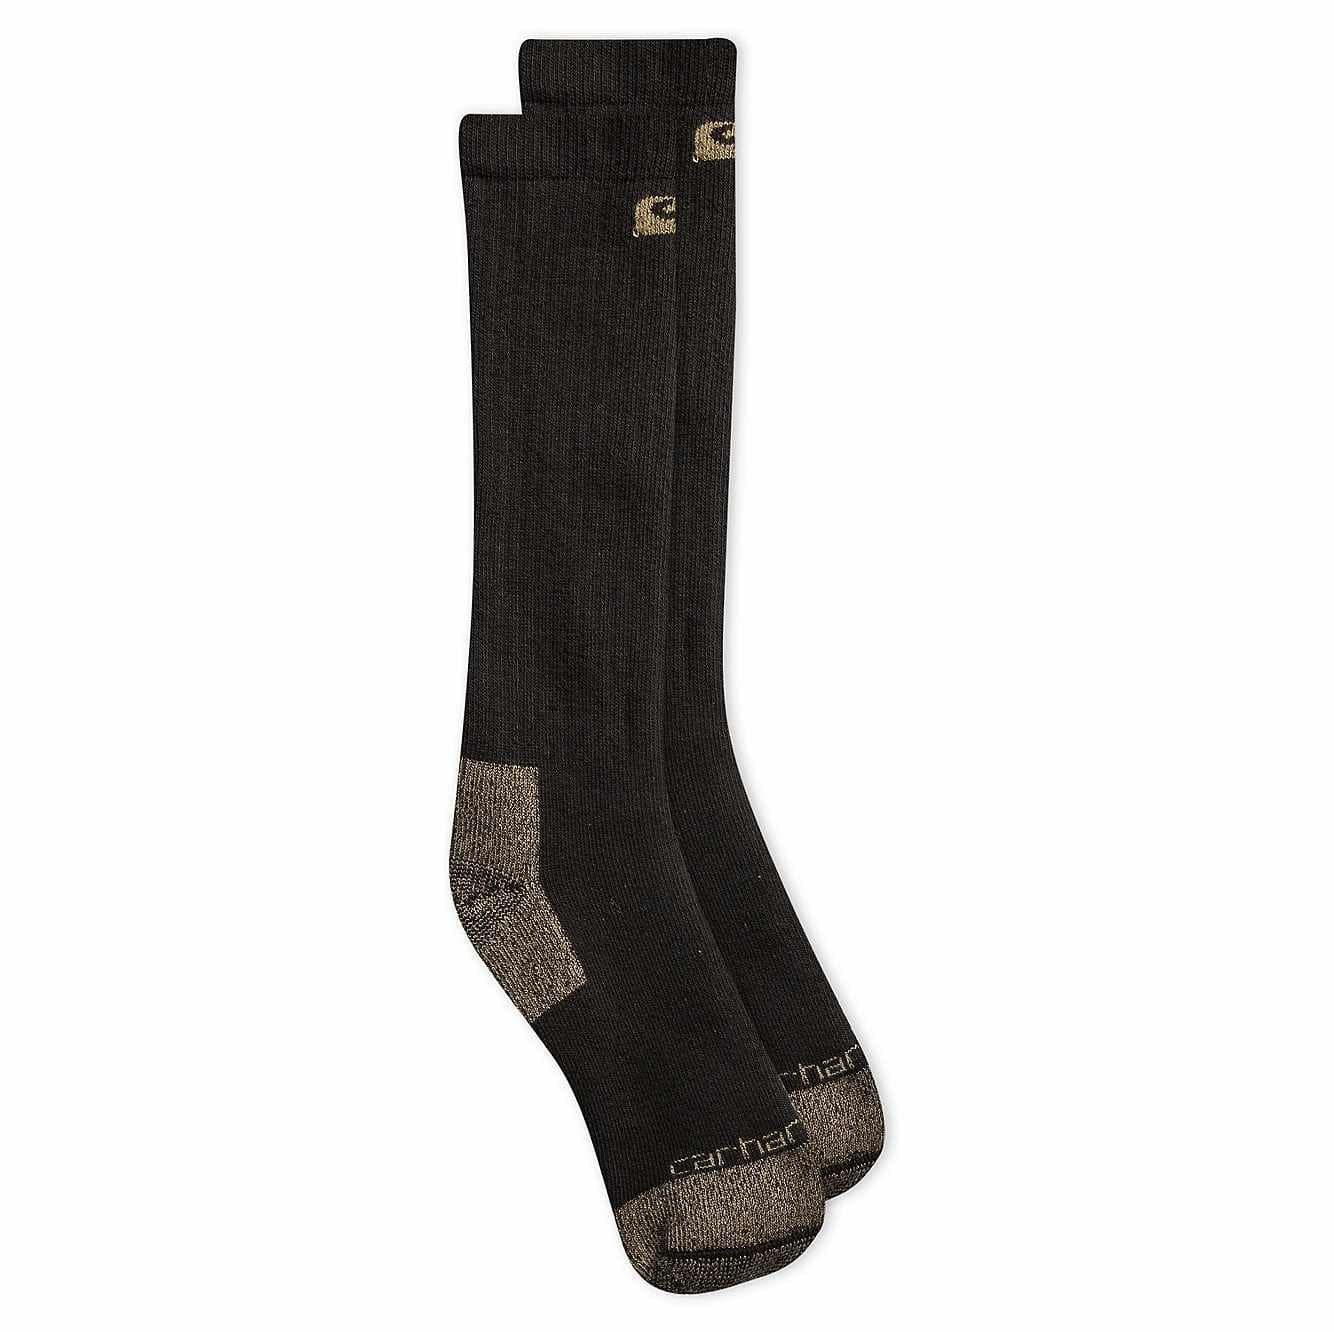 a33039695f166 Men's Full Cushion Steel-Toe Cotton Work Boot Sock 2 Pack | Carhartt